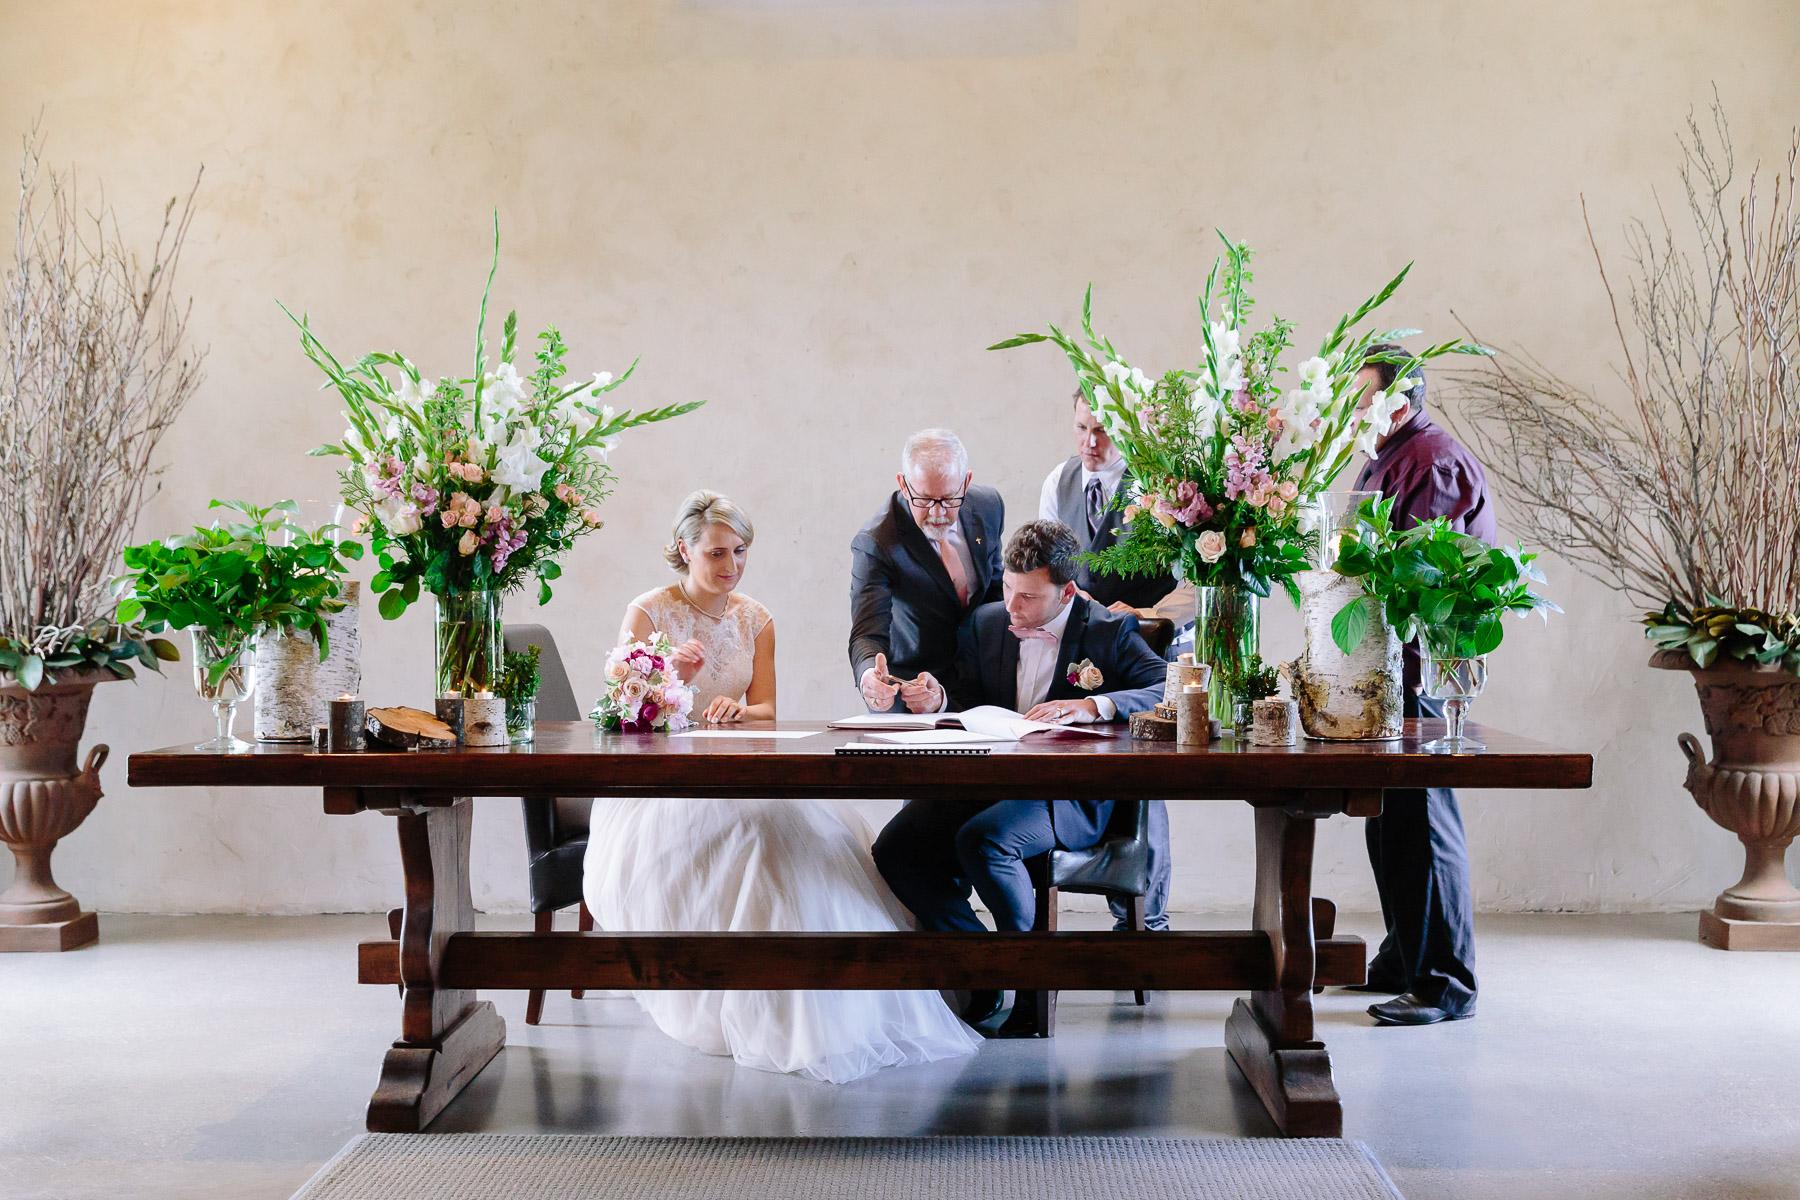 Marnie_and_Charlie_Yarra_Valley_Wedding_Blog-50.jpg